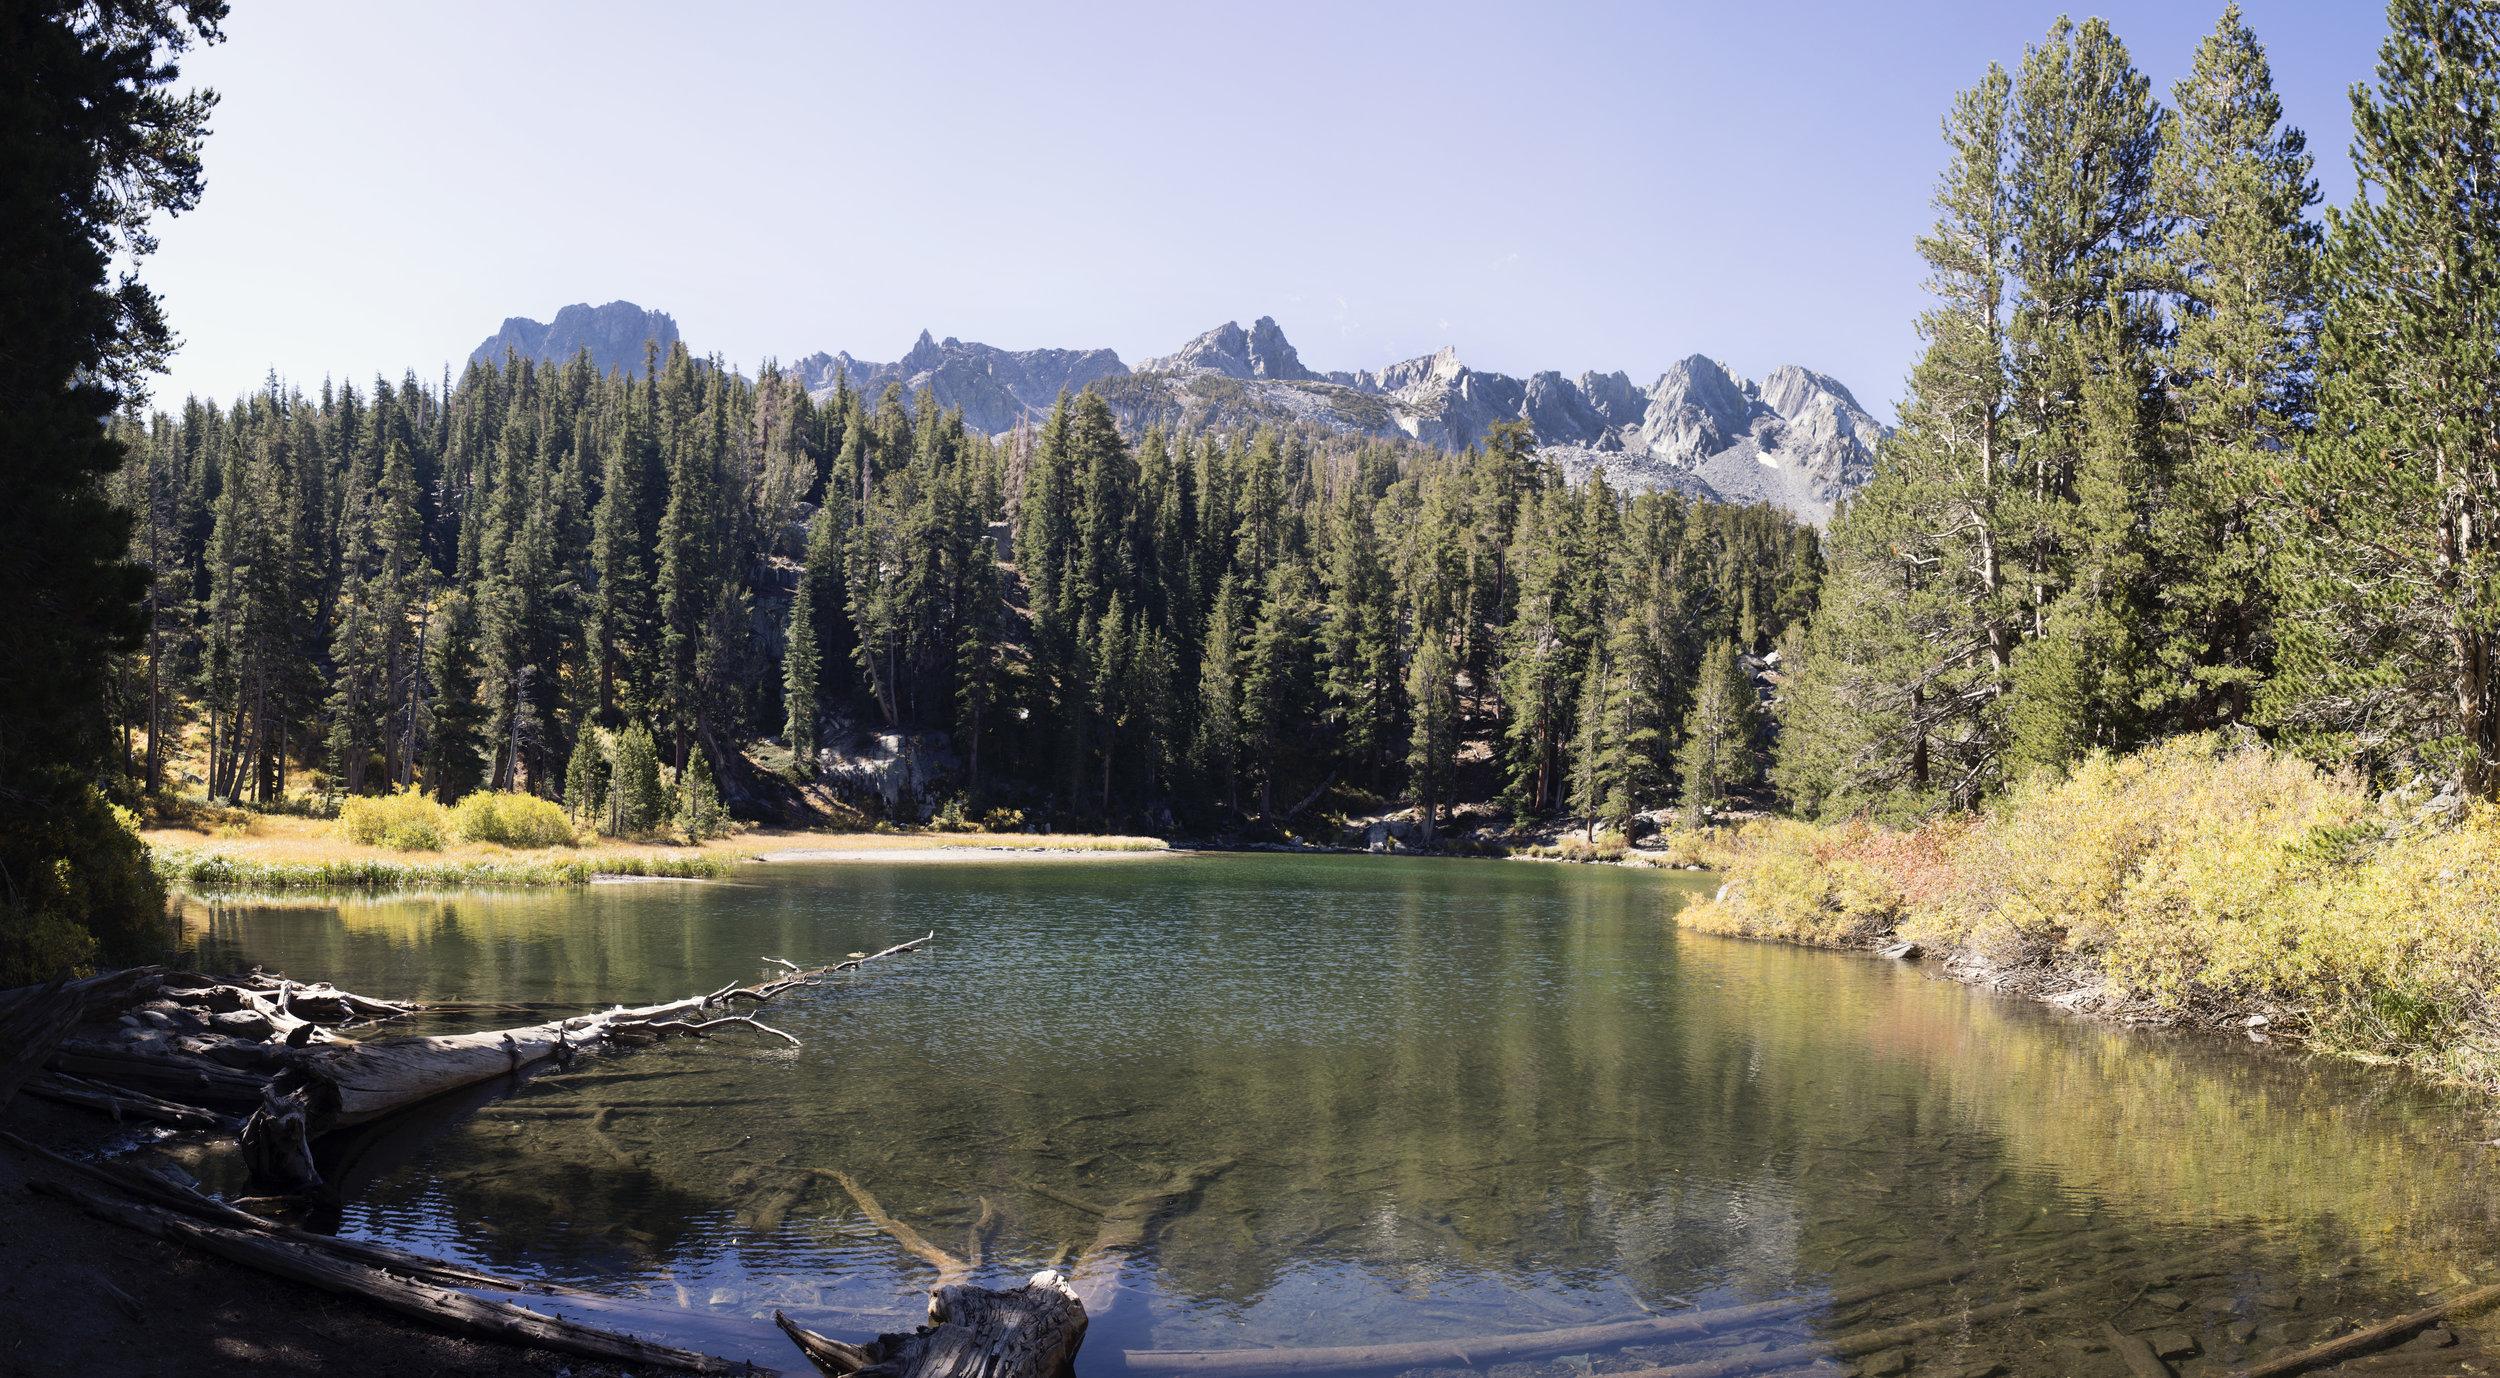 Emeral Lake, Mammoth Lakes, California